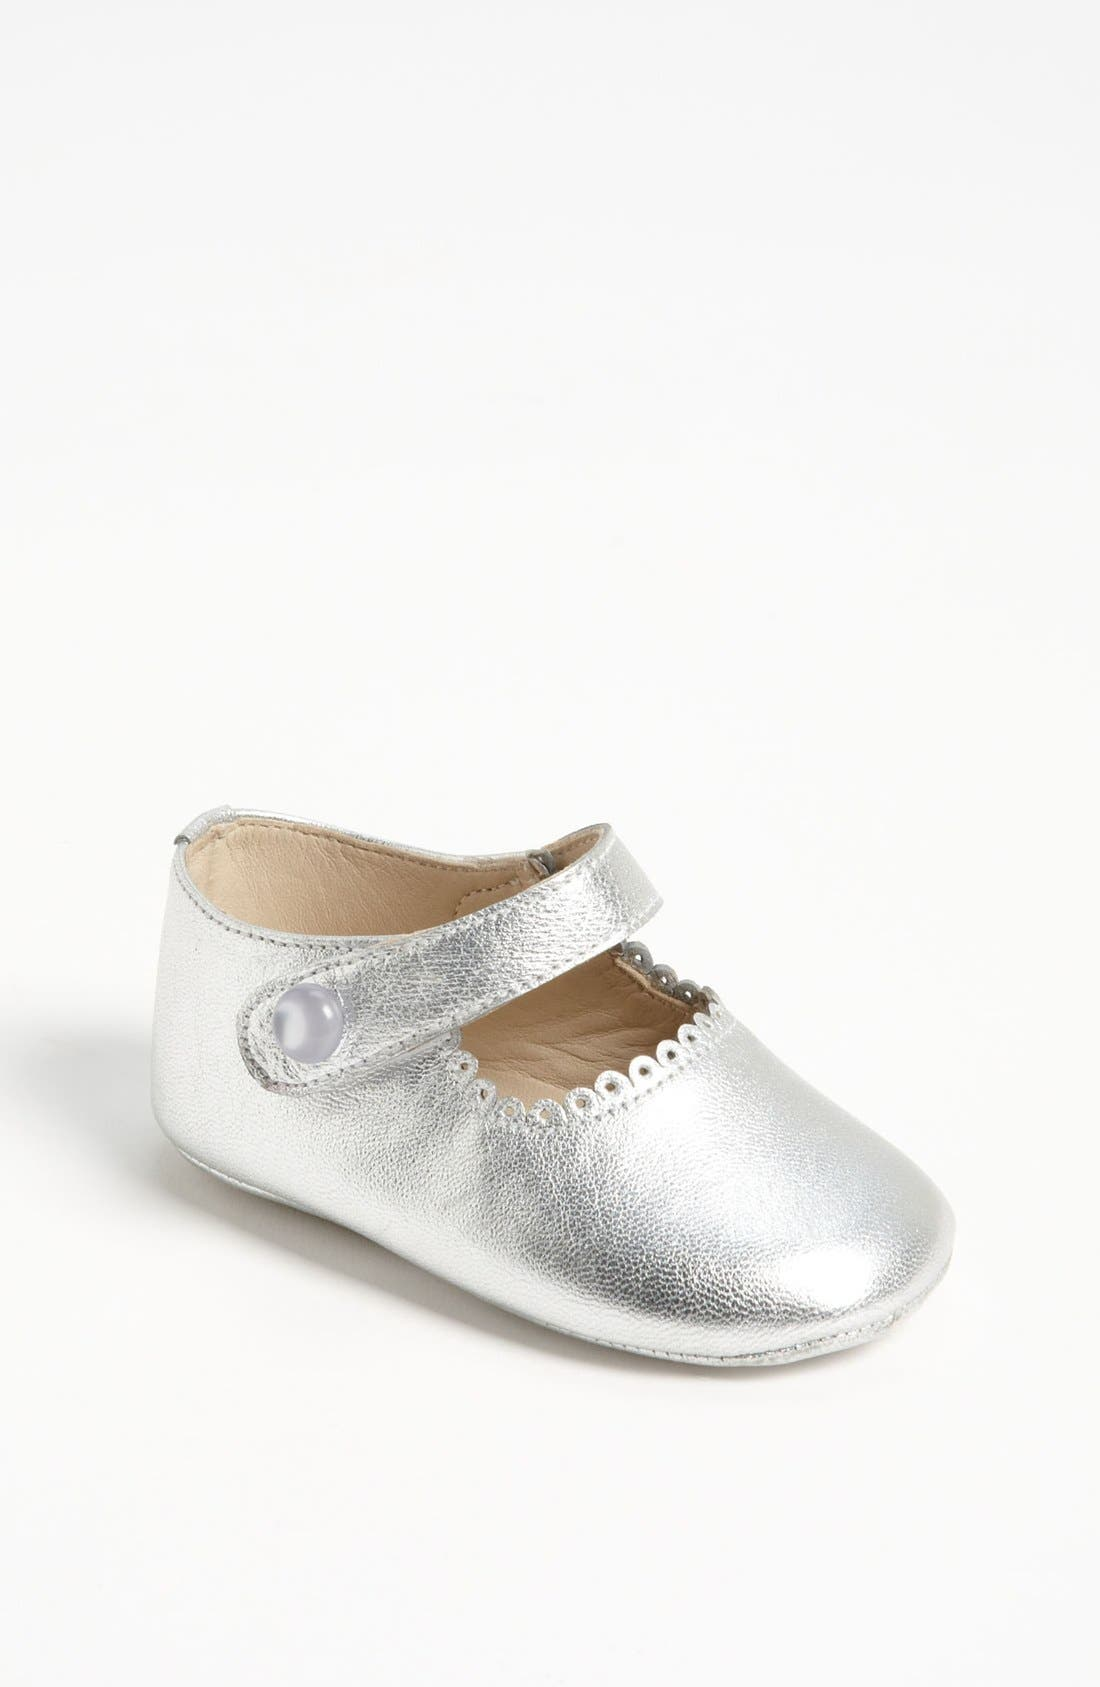 K Crib Shoe Elephantito Kids Mary Jane Baby